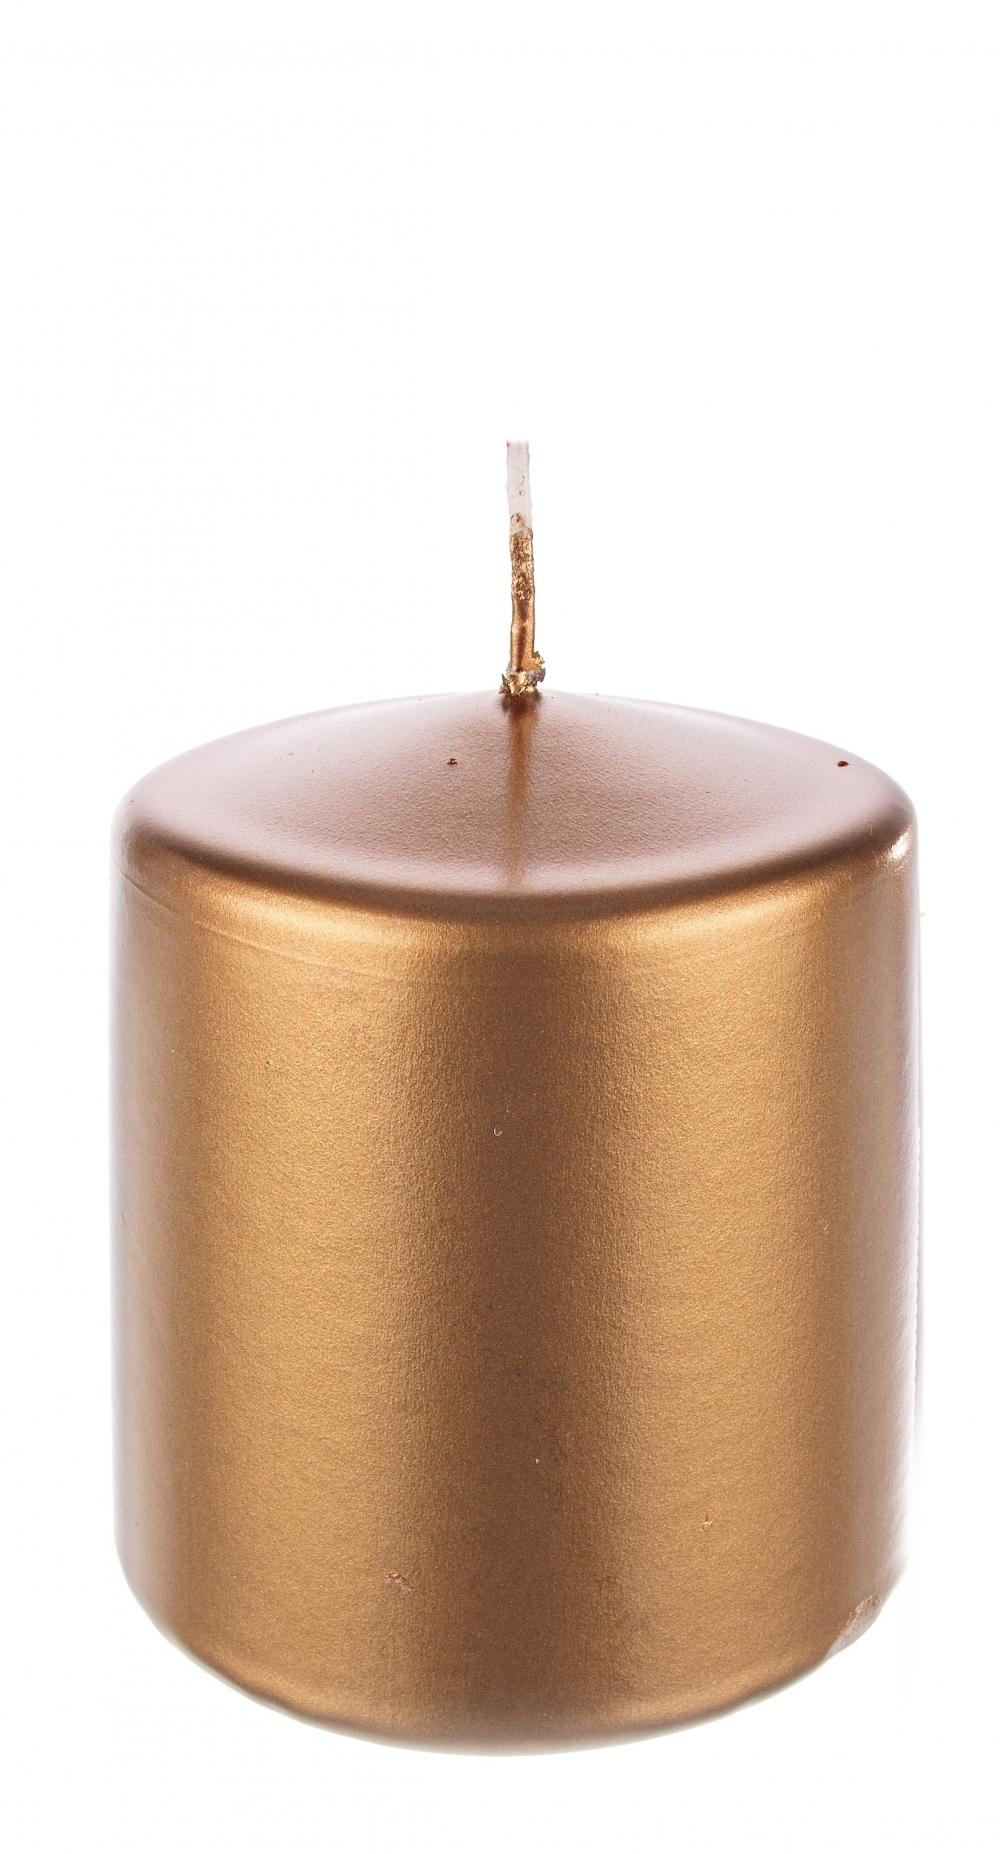 Lumanare stalp Copper H8cm imagine 2021 insignis.ro